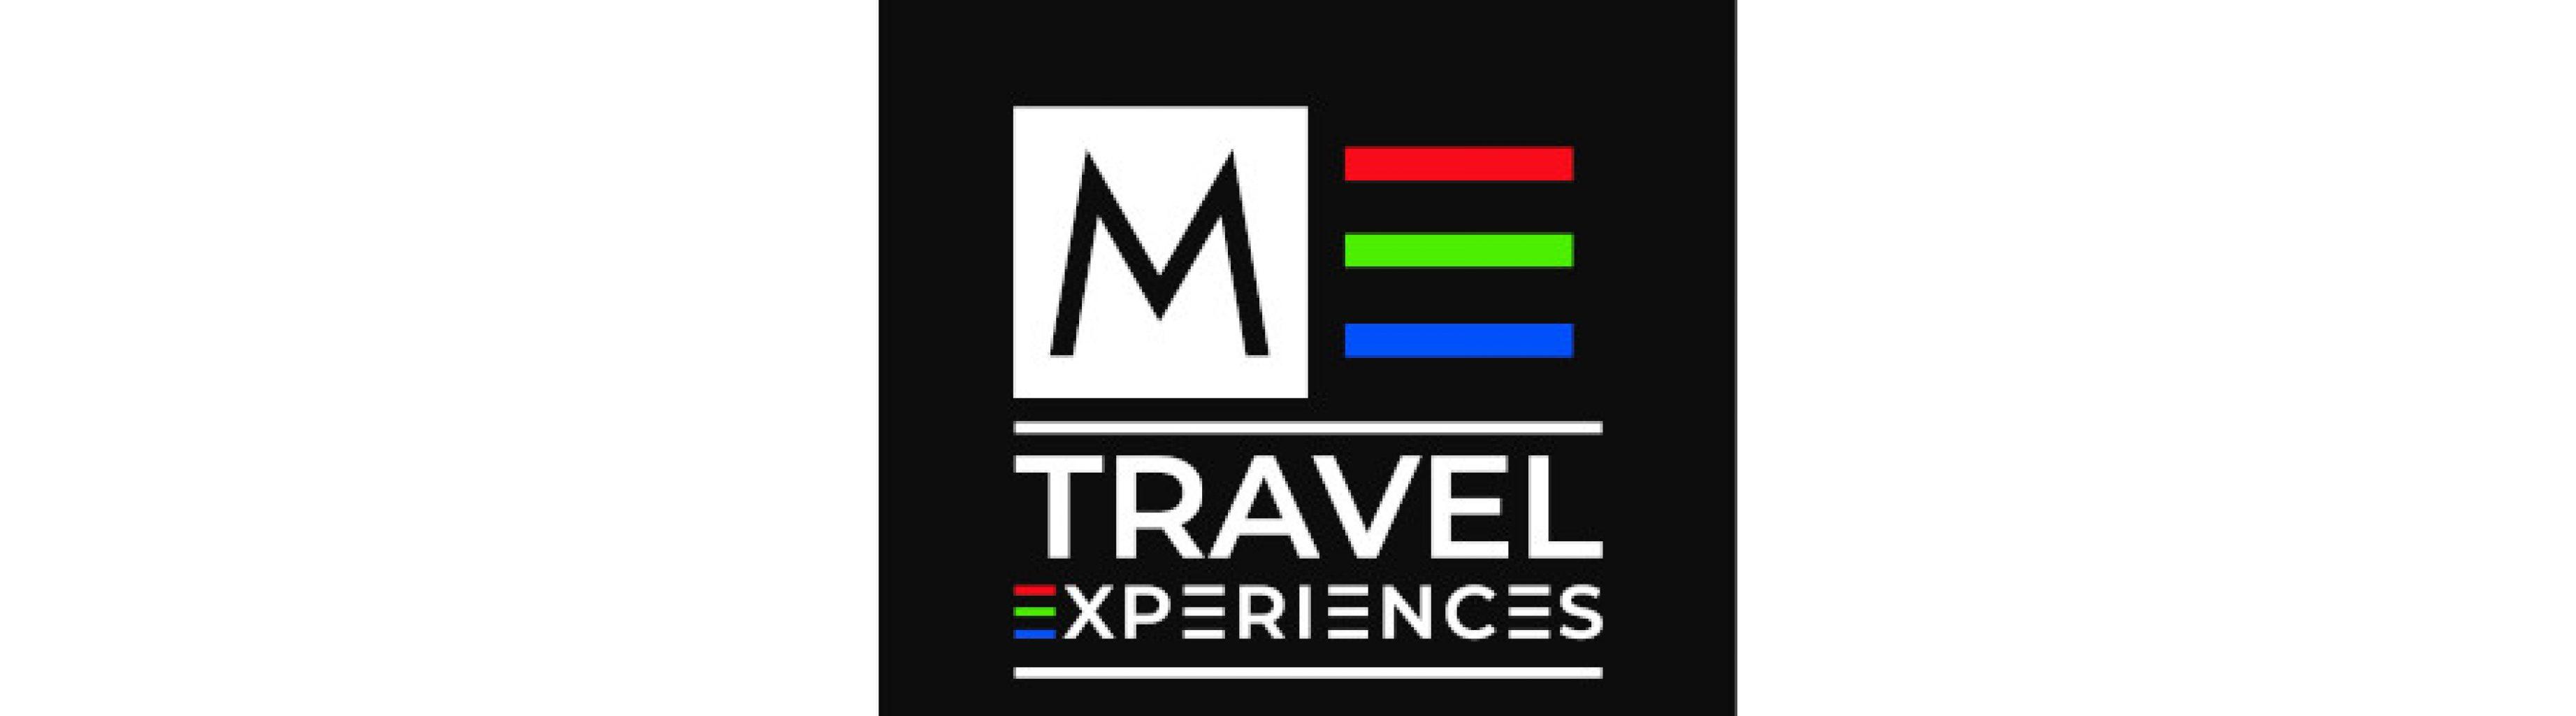 m-travelexperiences